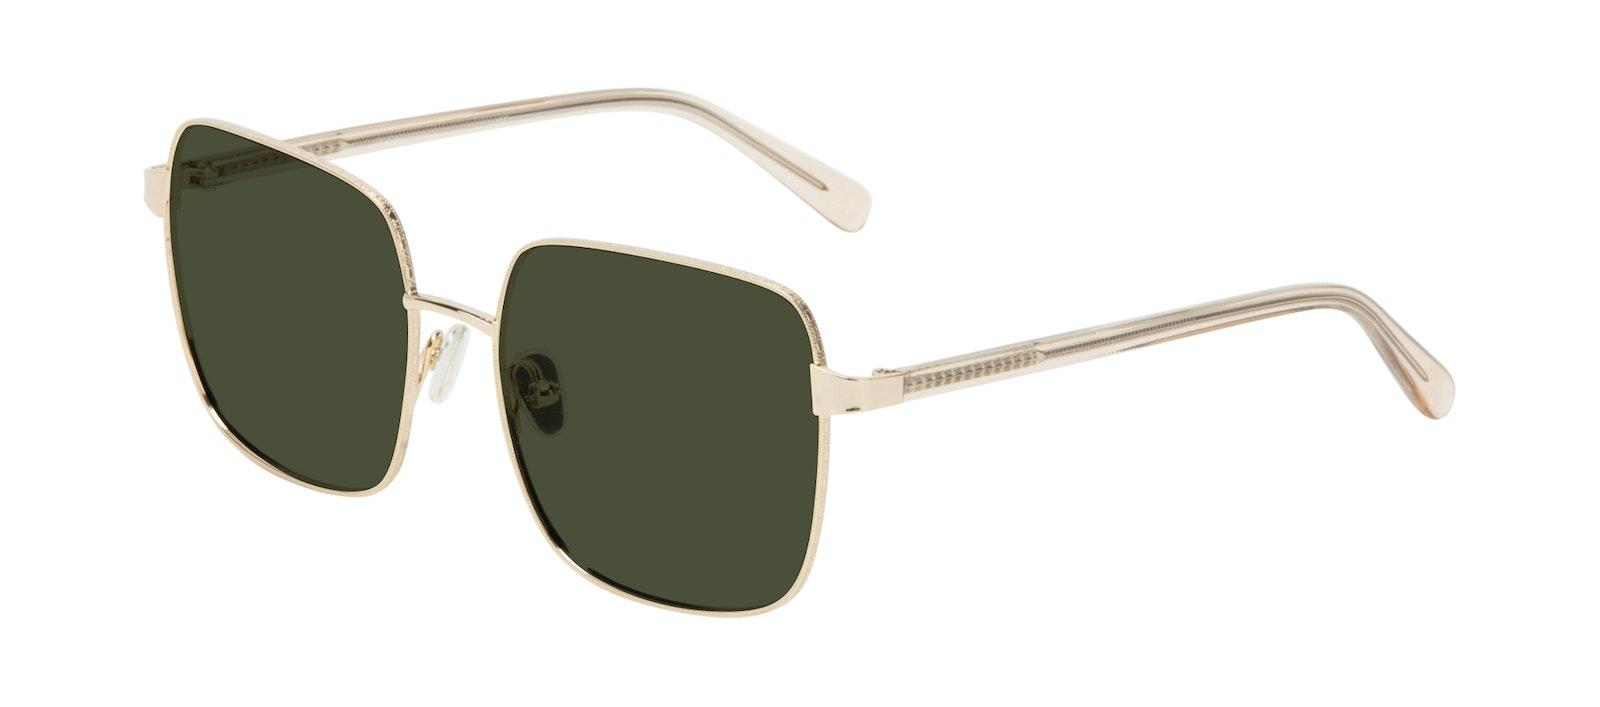 Affordable Fashion Glasses Square Sunglasses Women Fab Gold Tilt